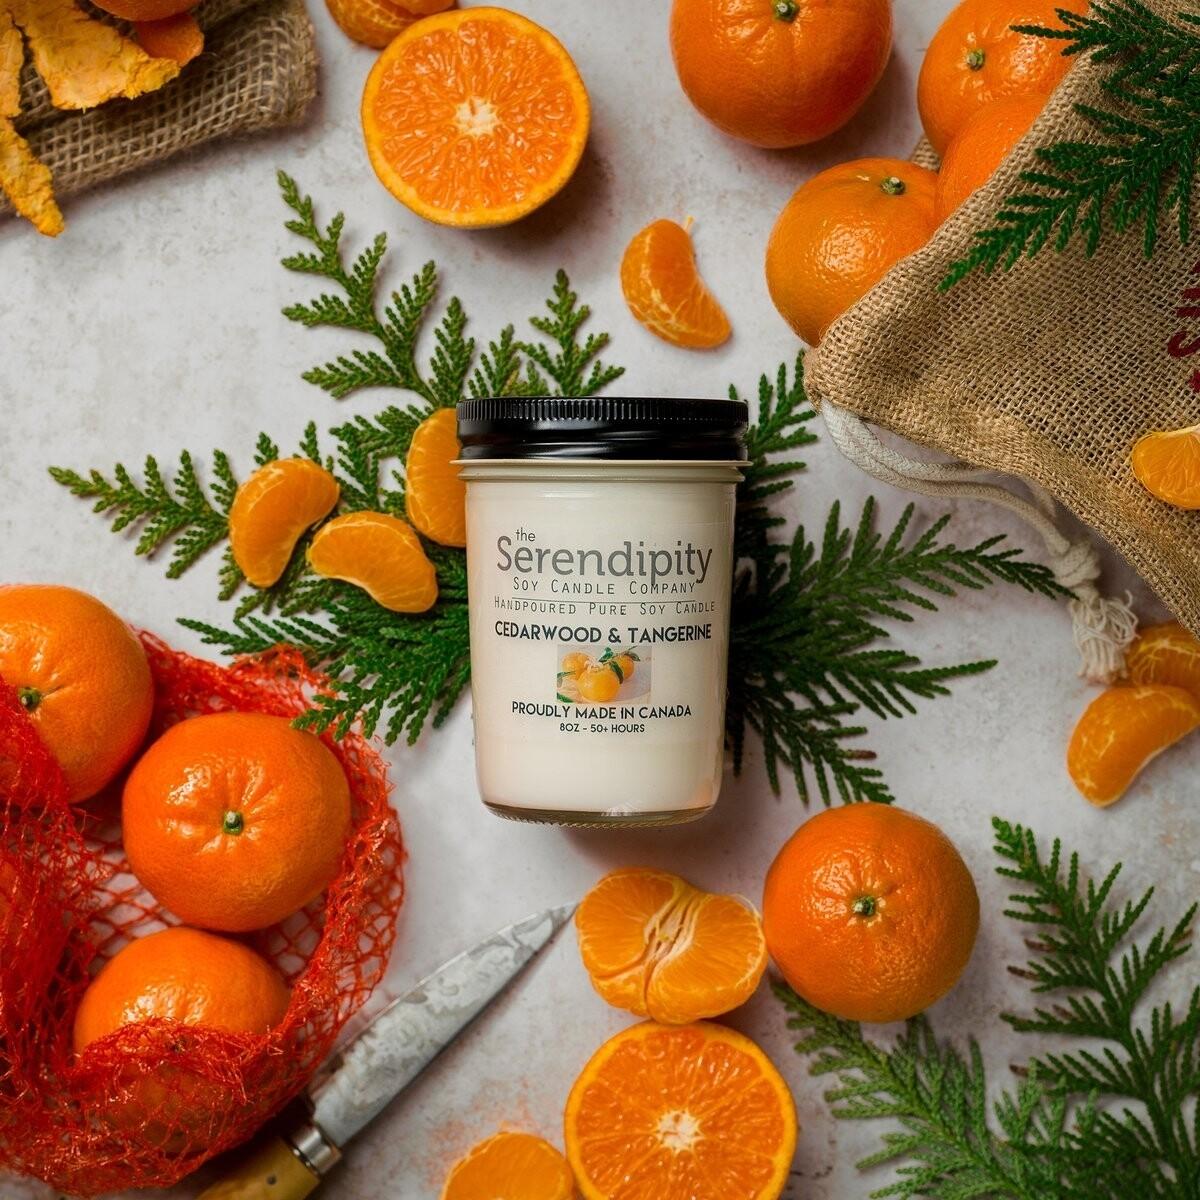 Serendipity 8 oz Soy Candle Jar | Cedarwood & Tangerine